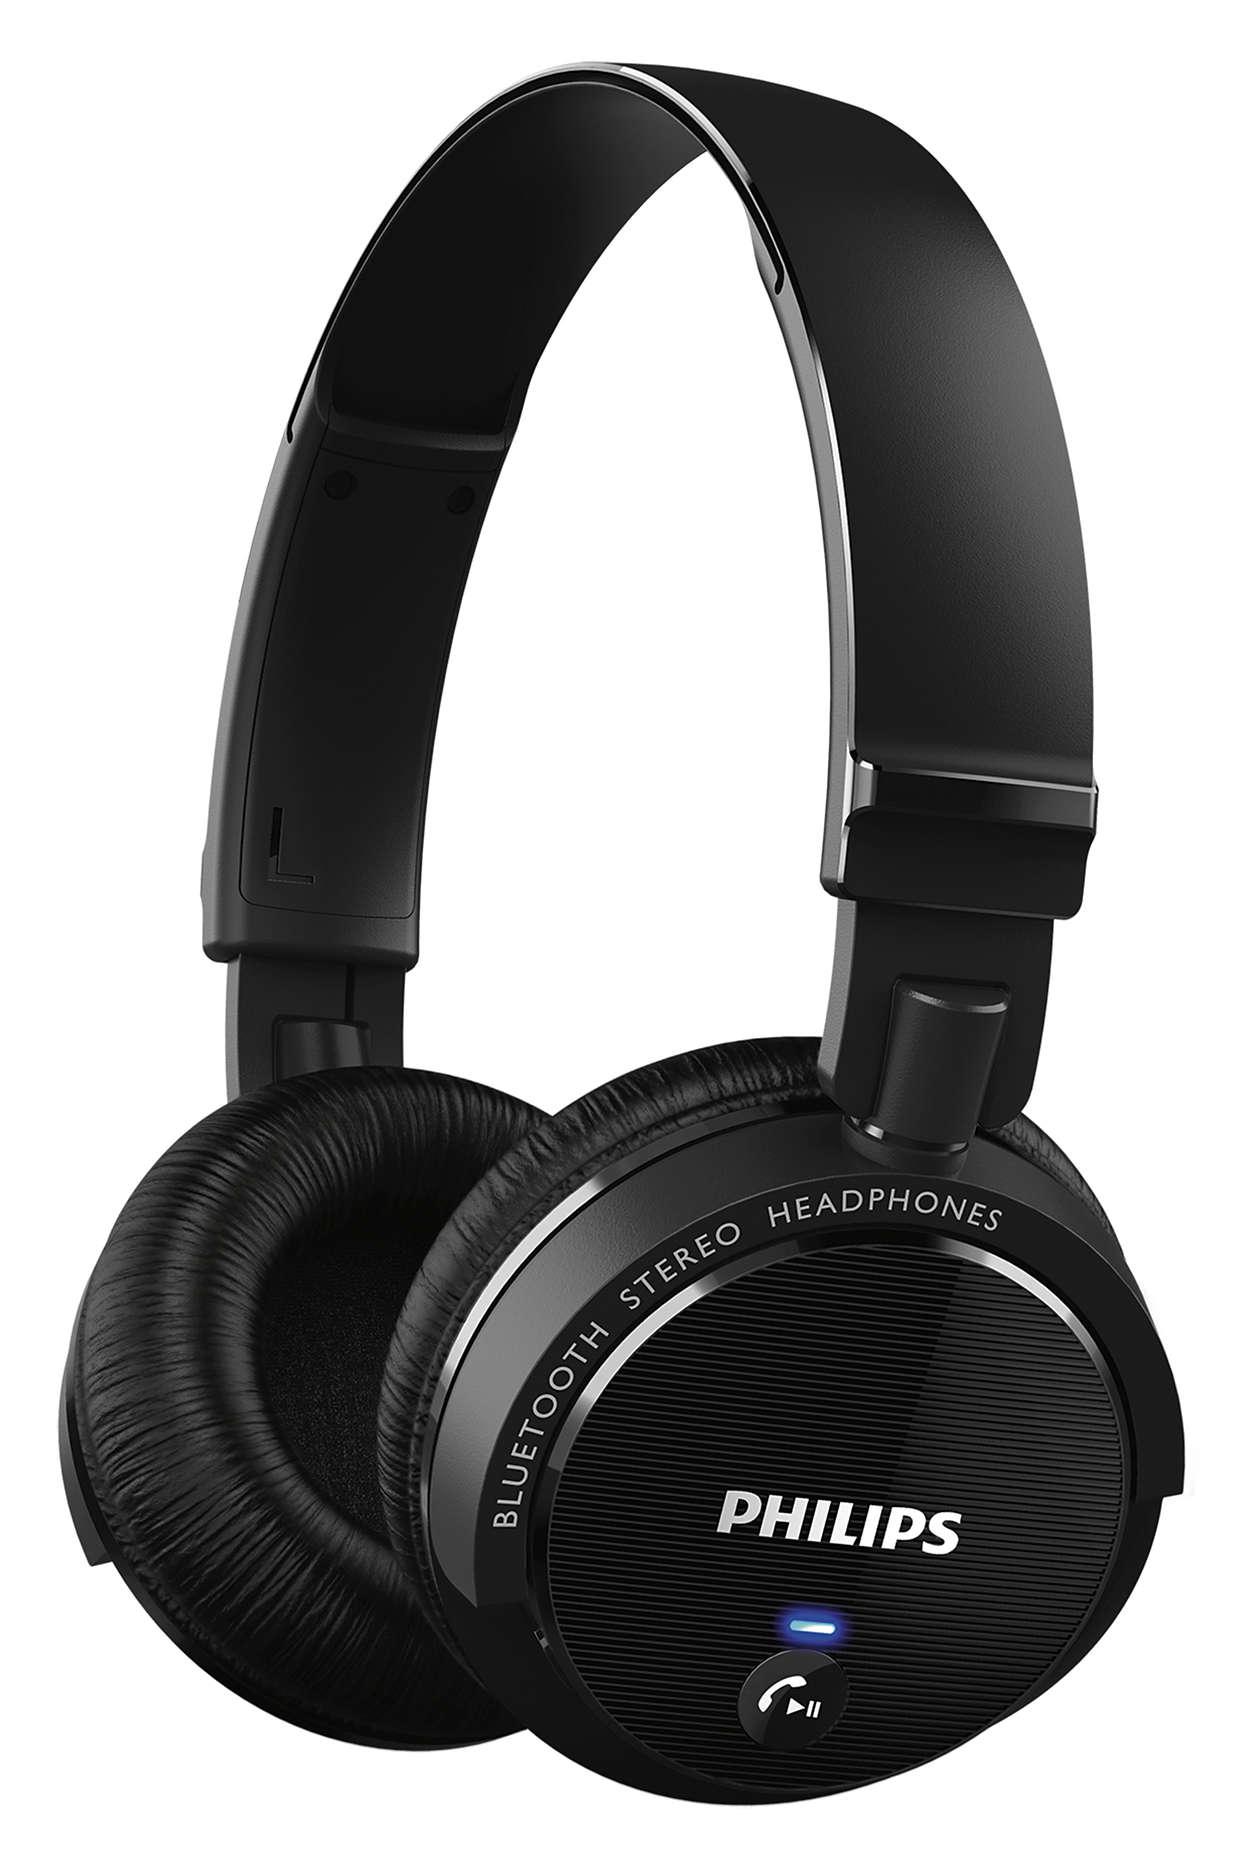 wireless bluetooth headphones shb5500bk 27 philips. Black Bedroom Furniture Sets. Home Design Ideas